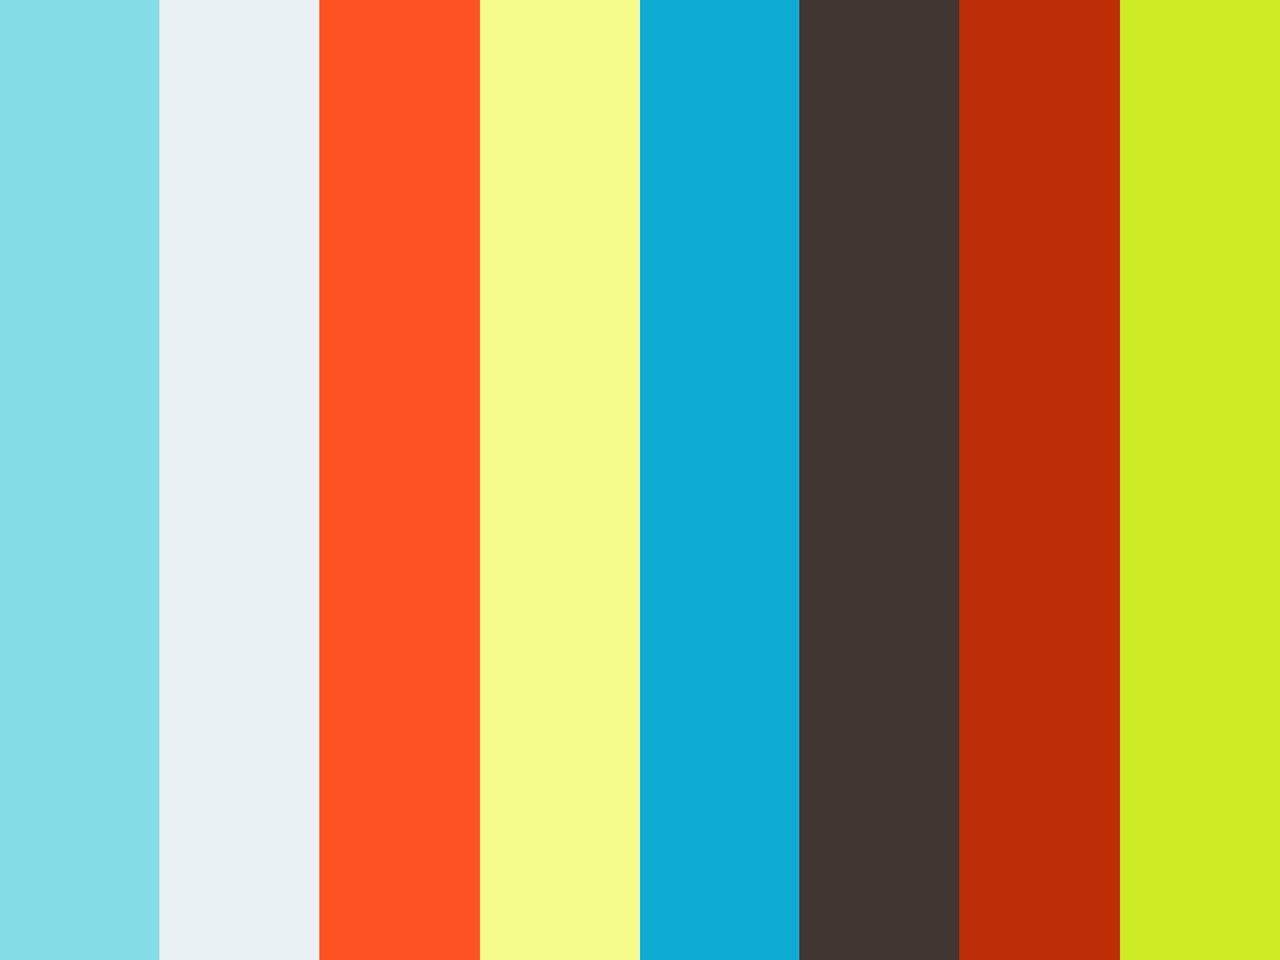 Molokai Covid19 Update - Tuesday, April 14, 2020